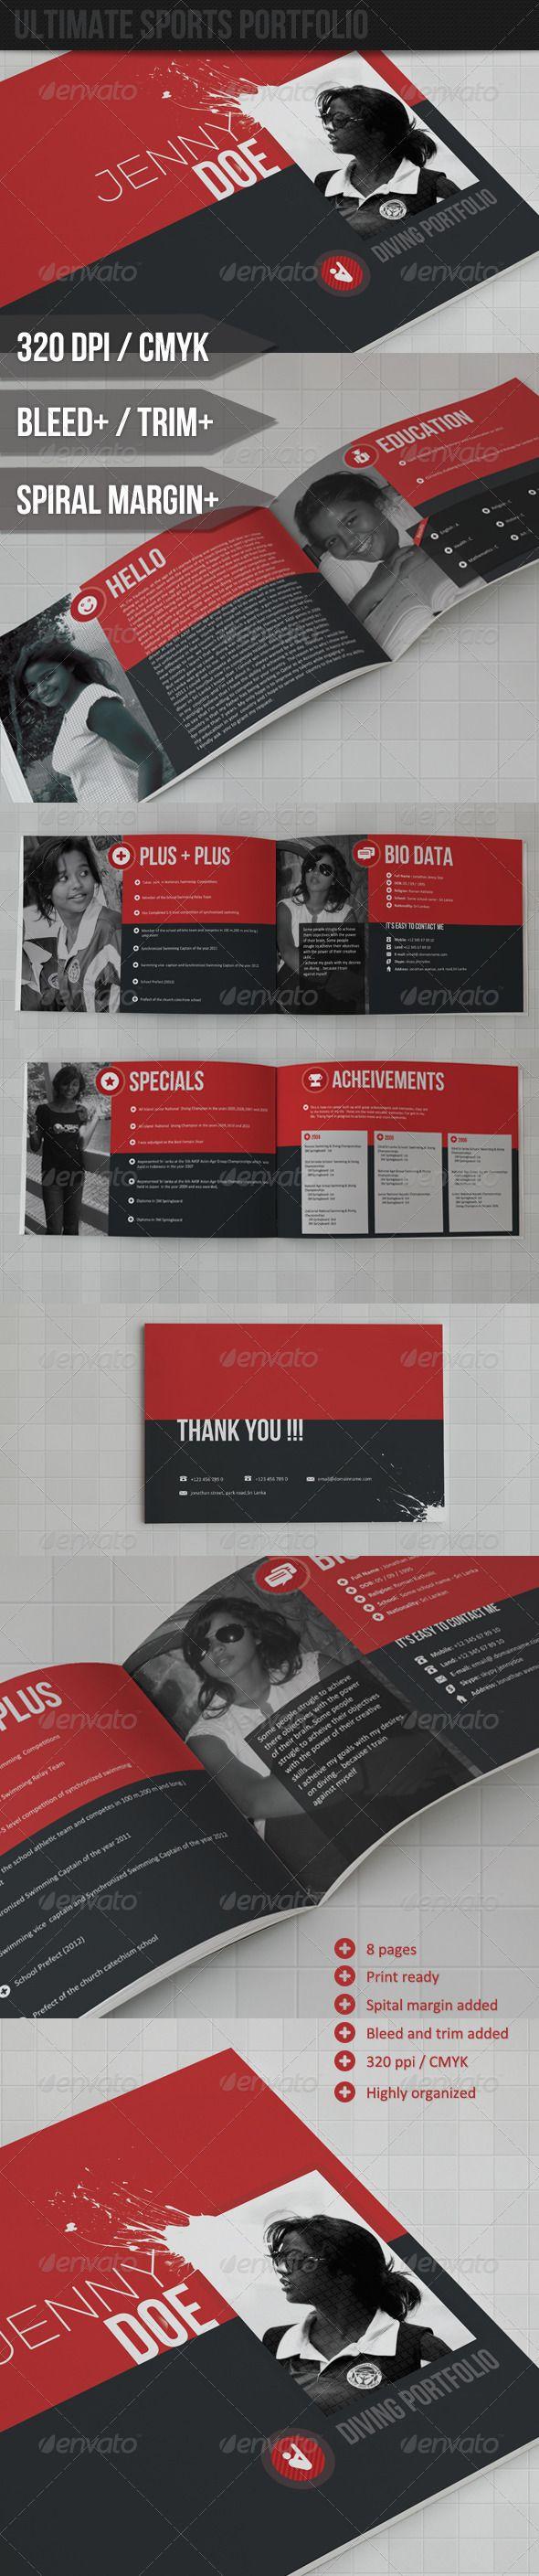 Sports Portfolio Resume   CV / Resume / Print designs   Pinterest ...